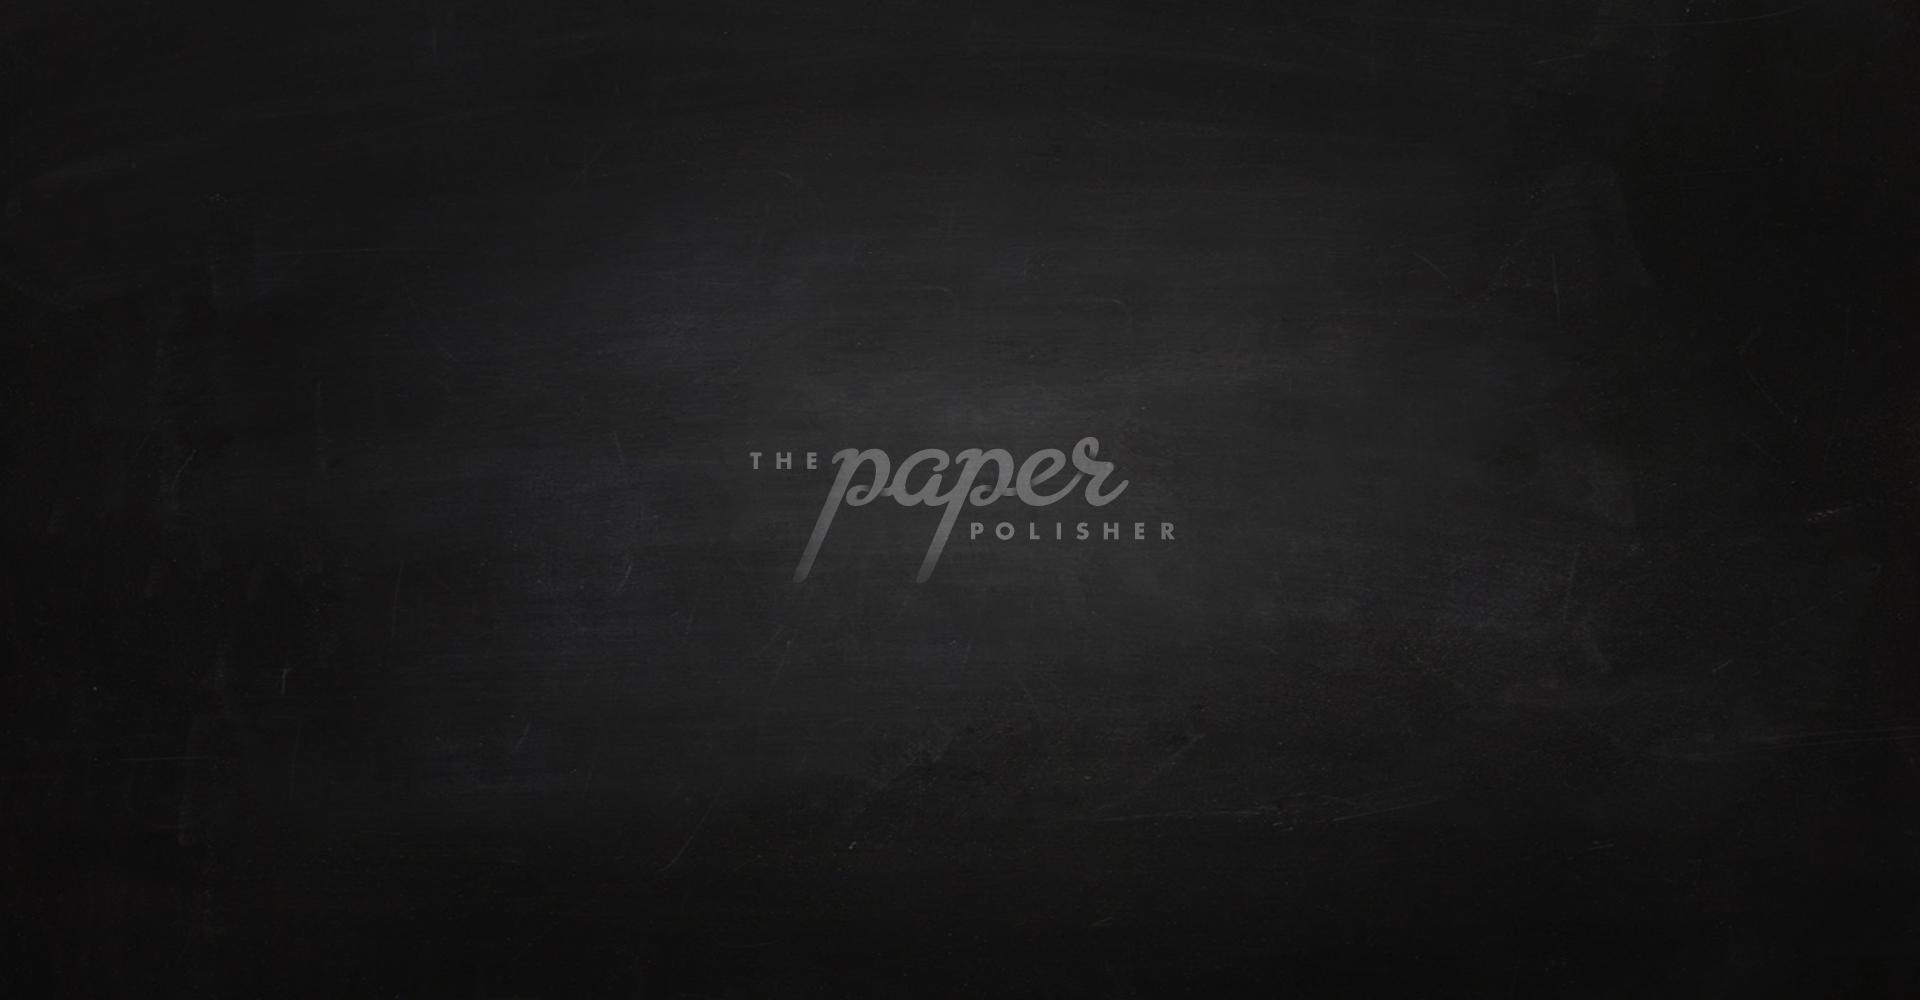 Paperpolisher header